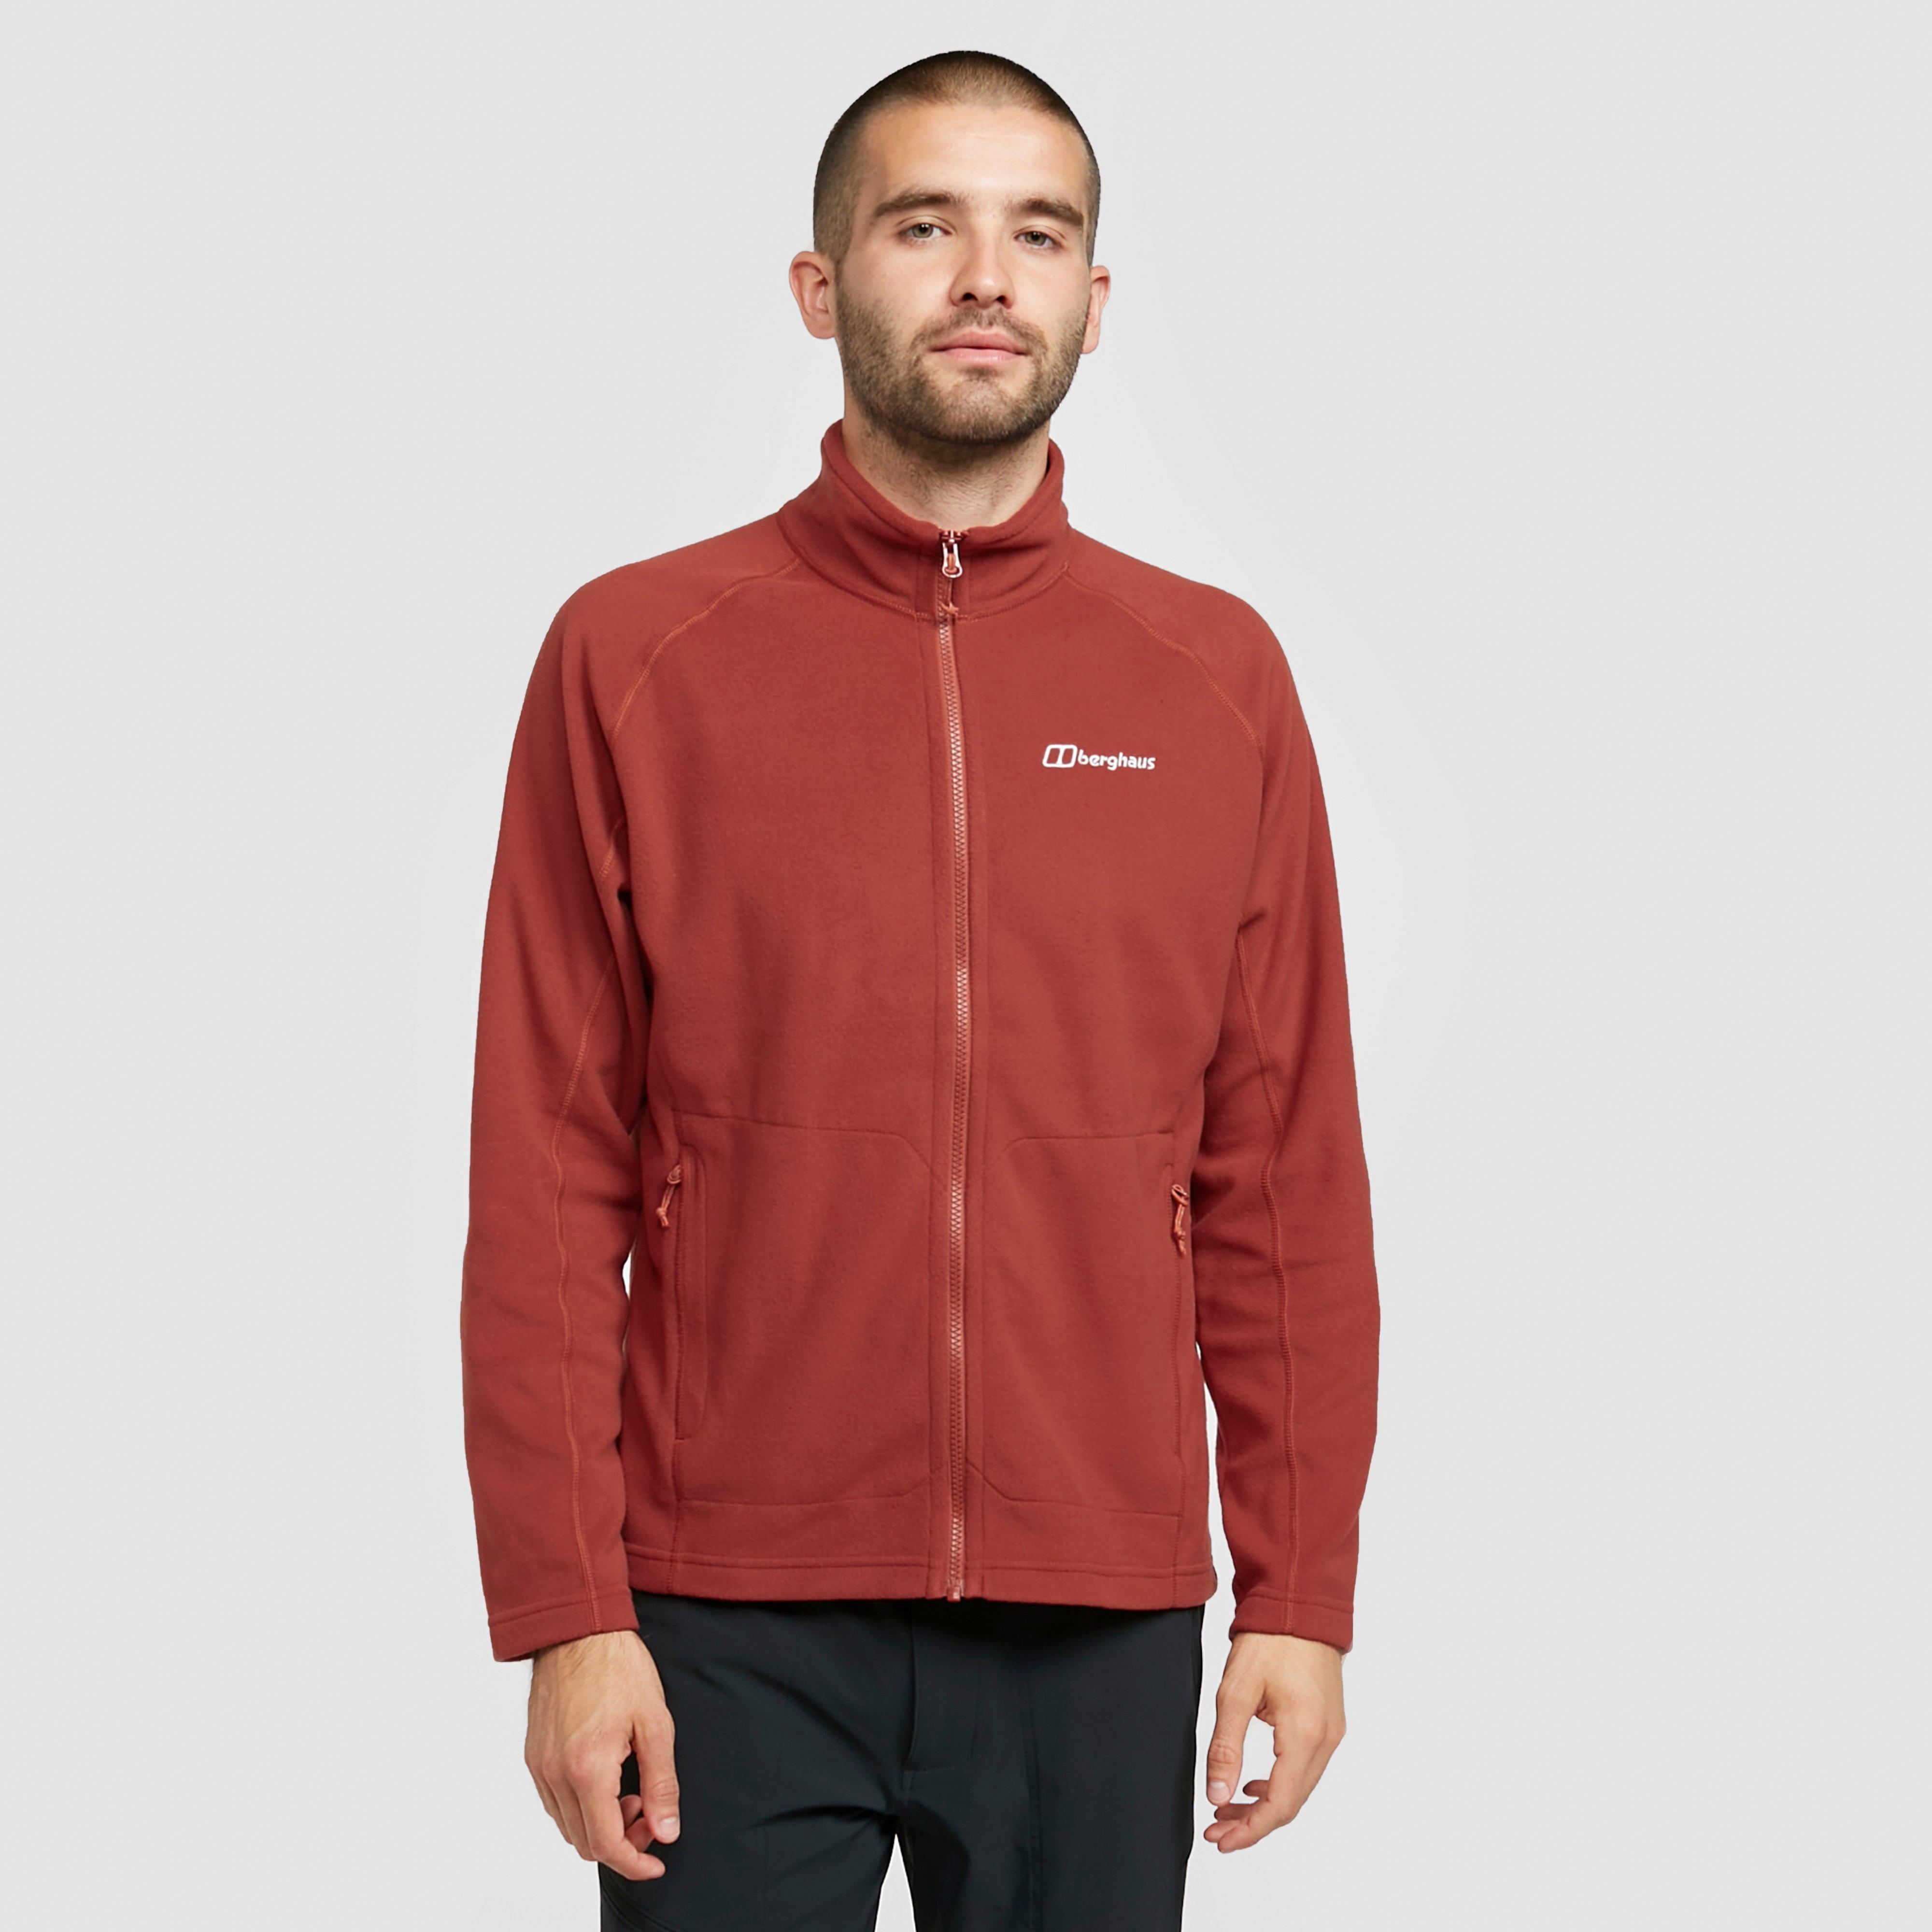 Berghaus Mens Hartsop Full-zip Fleece - Red  Red